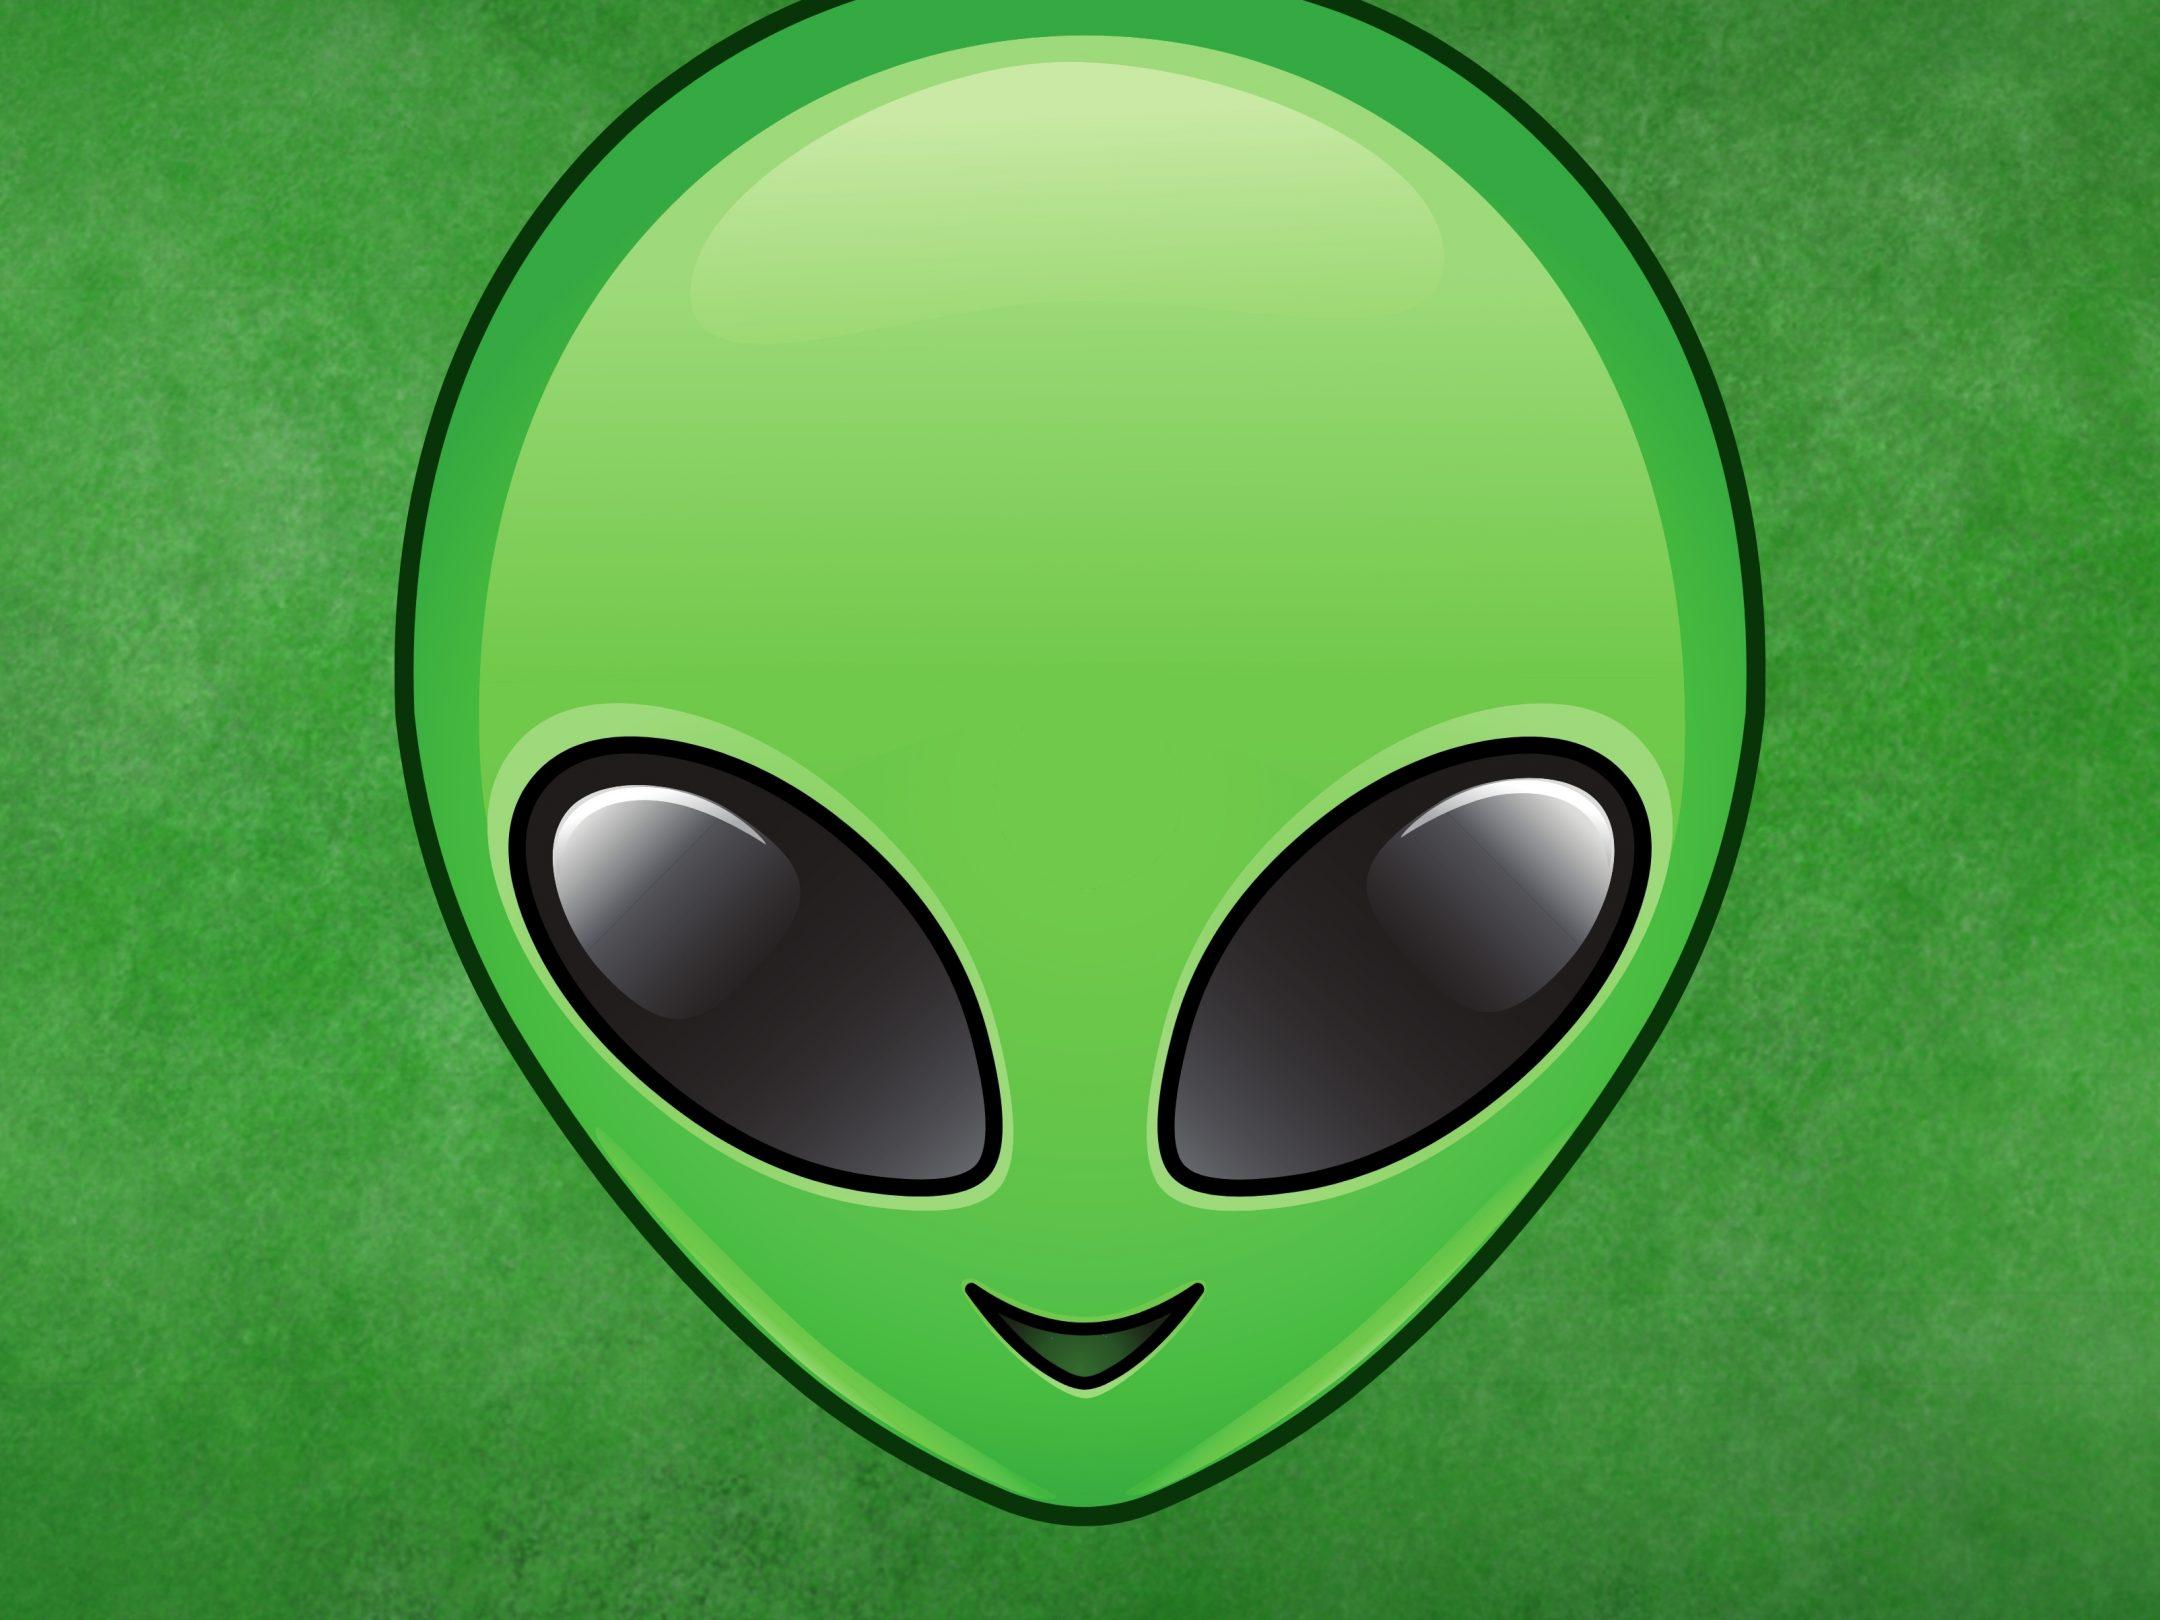 2160x1620 iPad wallpaper 4k Alien Emoji Face Invader Halloween Spaceship Green iPad Wallpaper 2160x1620 pixels resolution